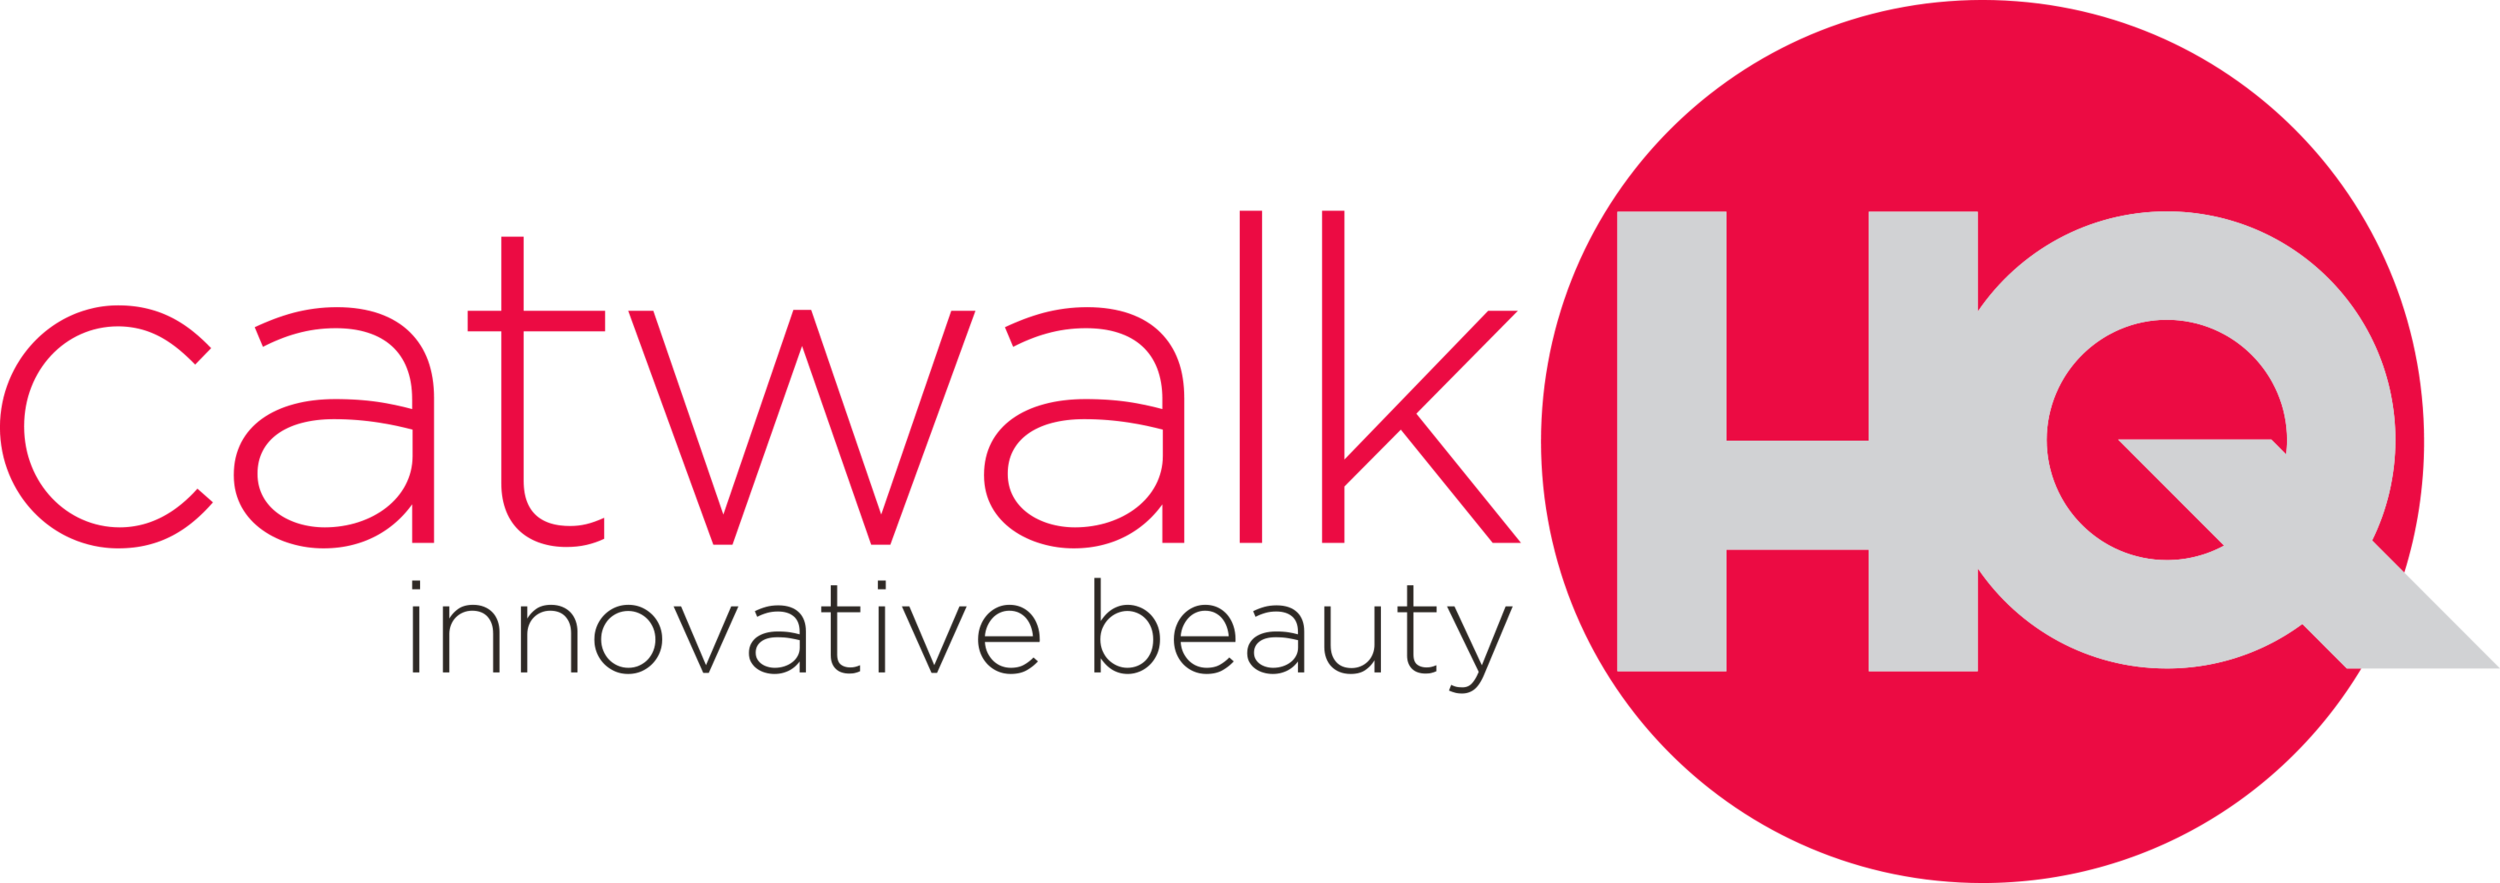 catwalkHQ-logo-1.png